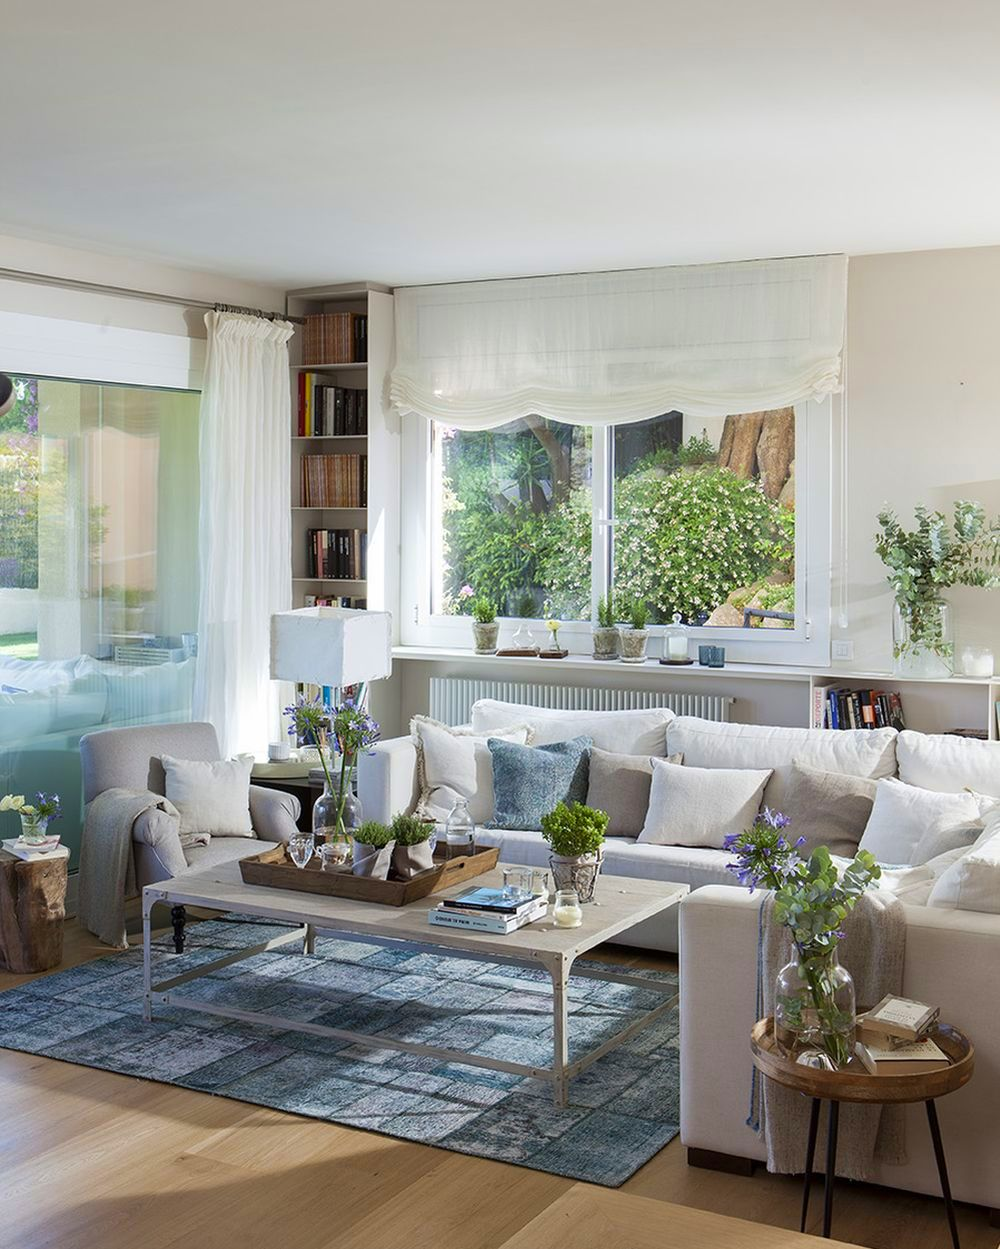 adelaparvu.com despre casa cu gradina, accente marine, designer Jeanette Dresing, Foto Feran Freixa (2)